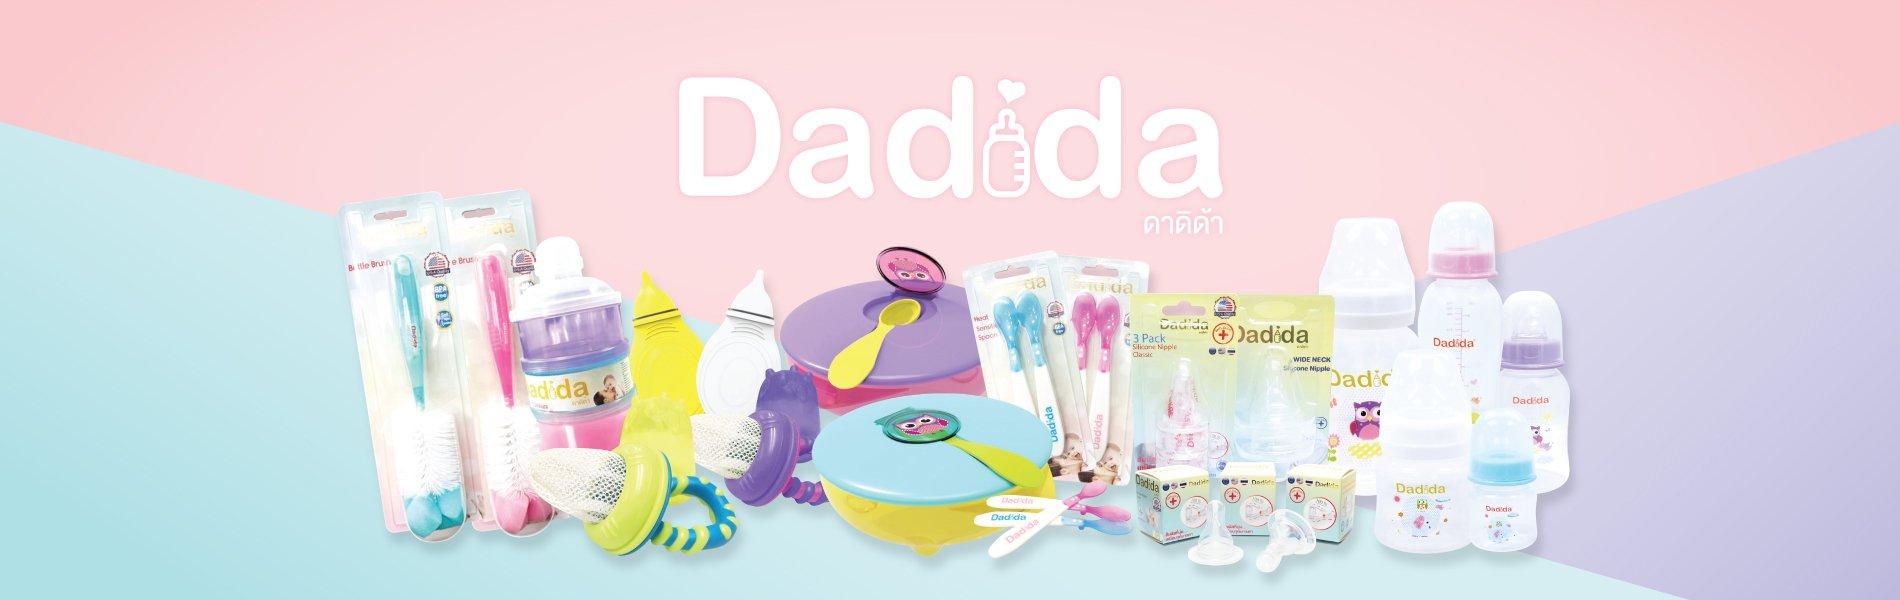 Dadida ดาดิด้า สินค้ารวม